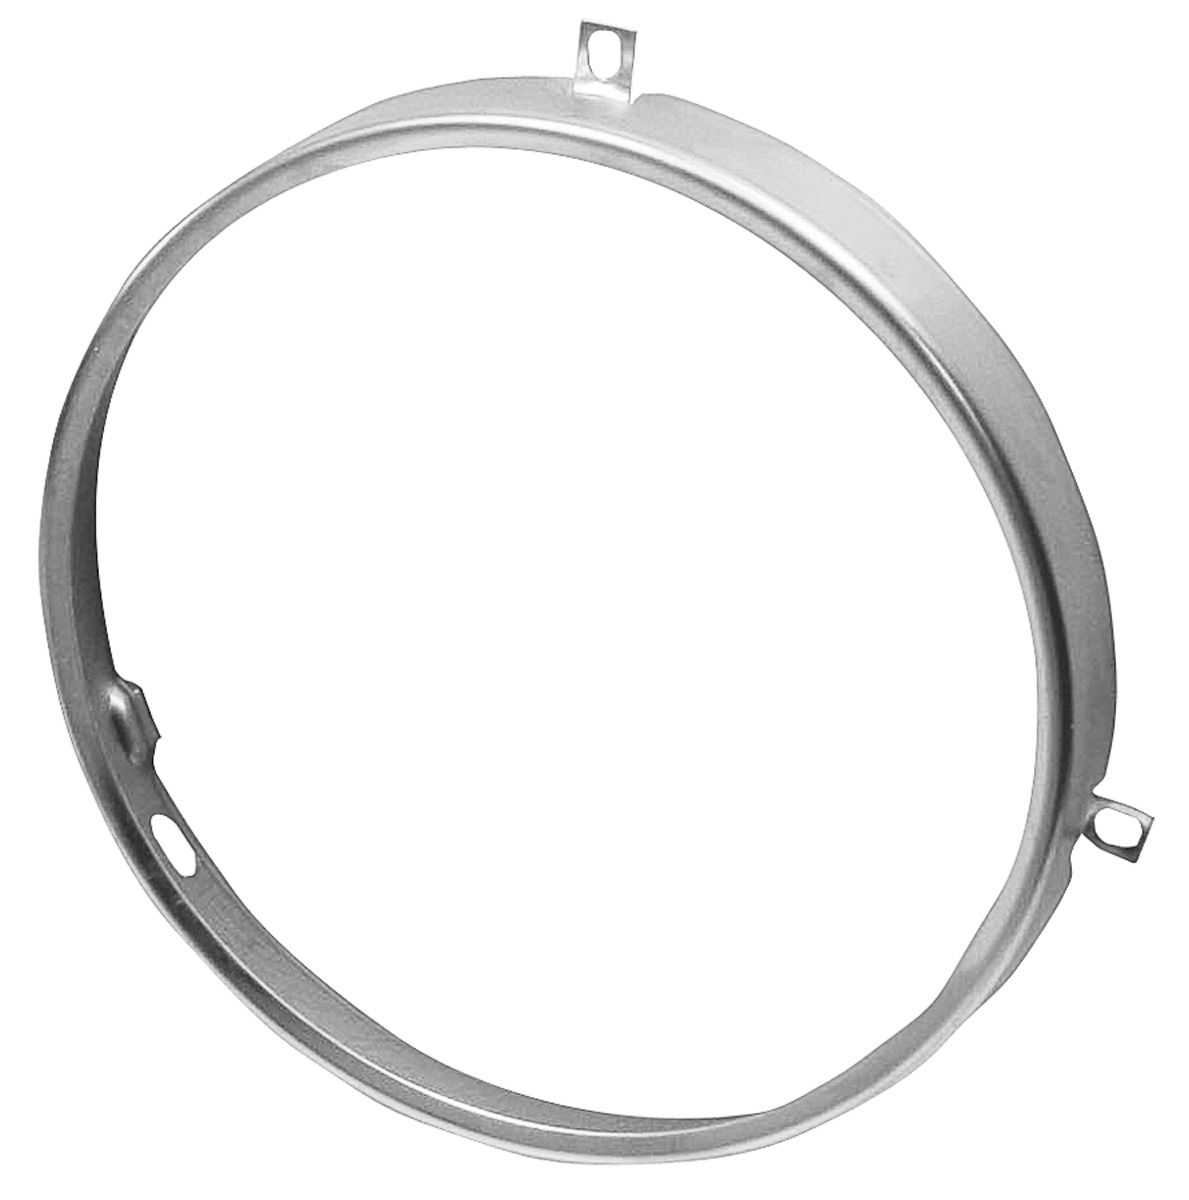 Photo of Headlamp Retaining Ring